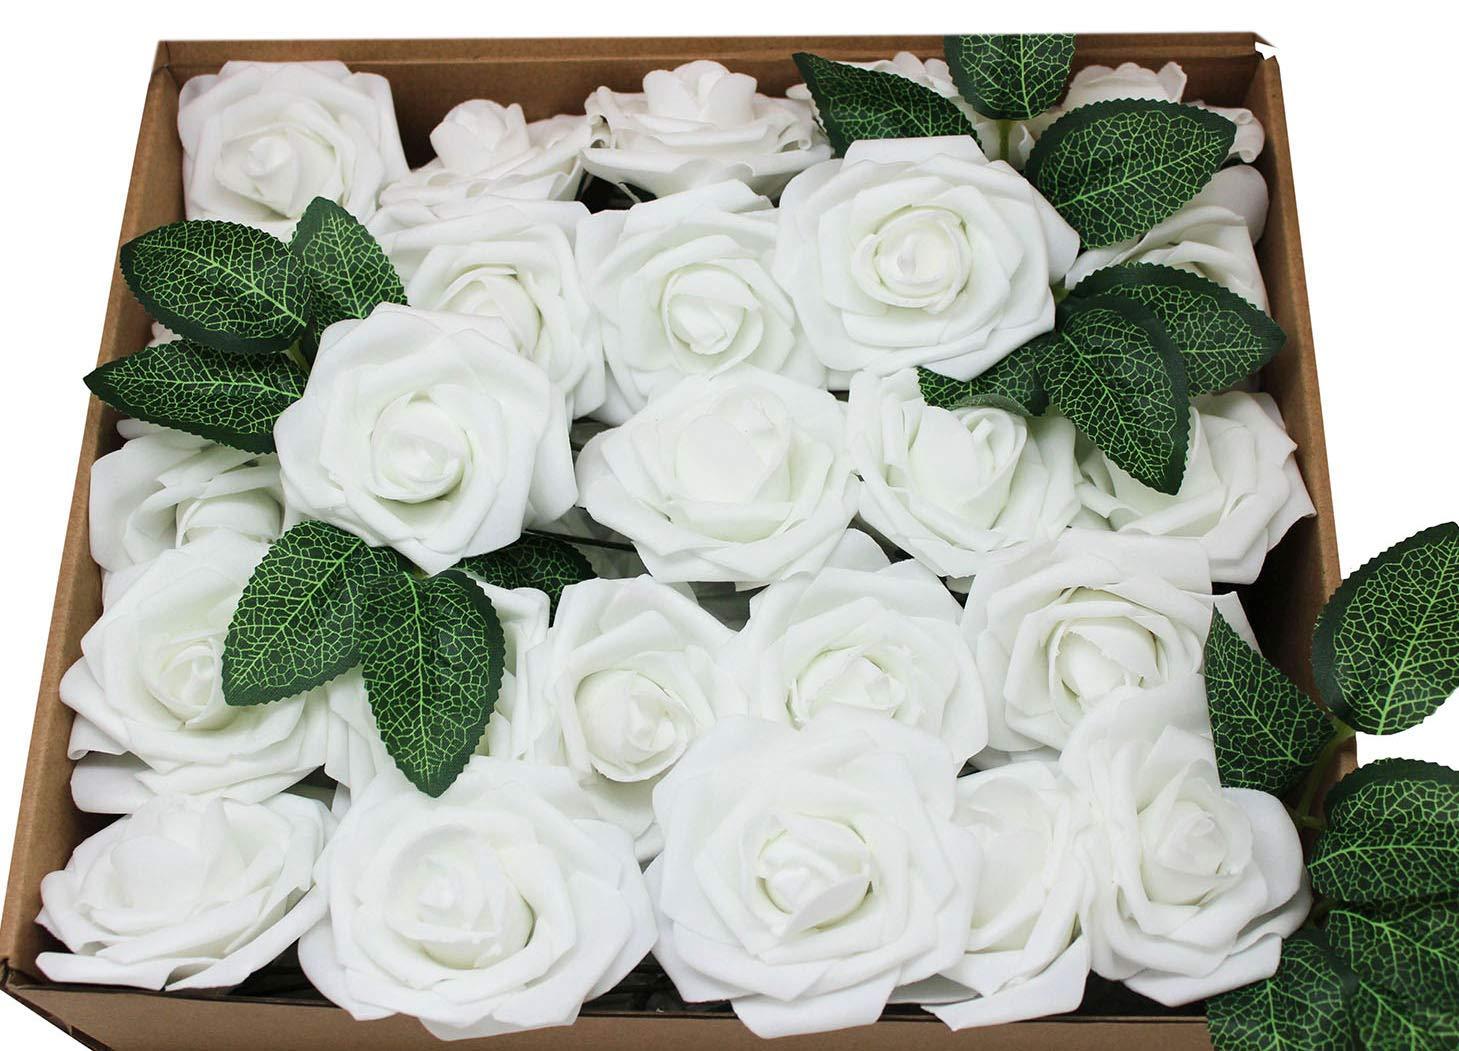 silk flower arrangements 50pcs artificial flowers rose real looking flower bouquets with stem for bridesmaid wedding party centerpieces arrangements decorations(white)